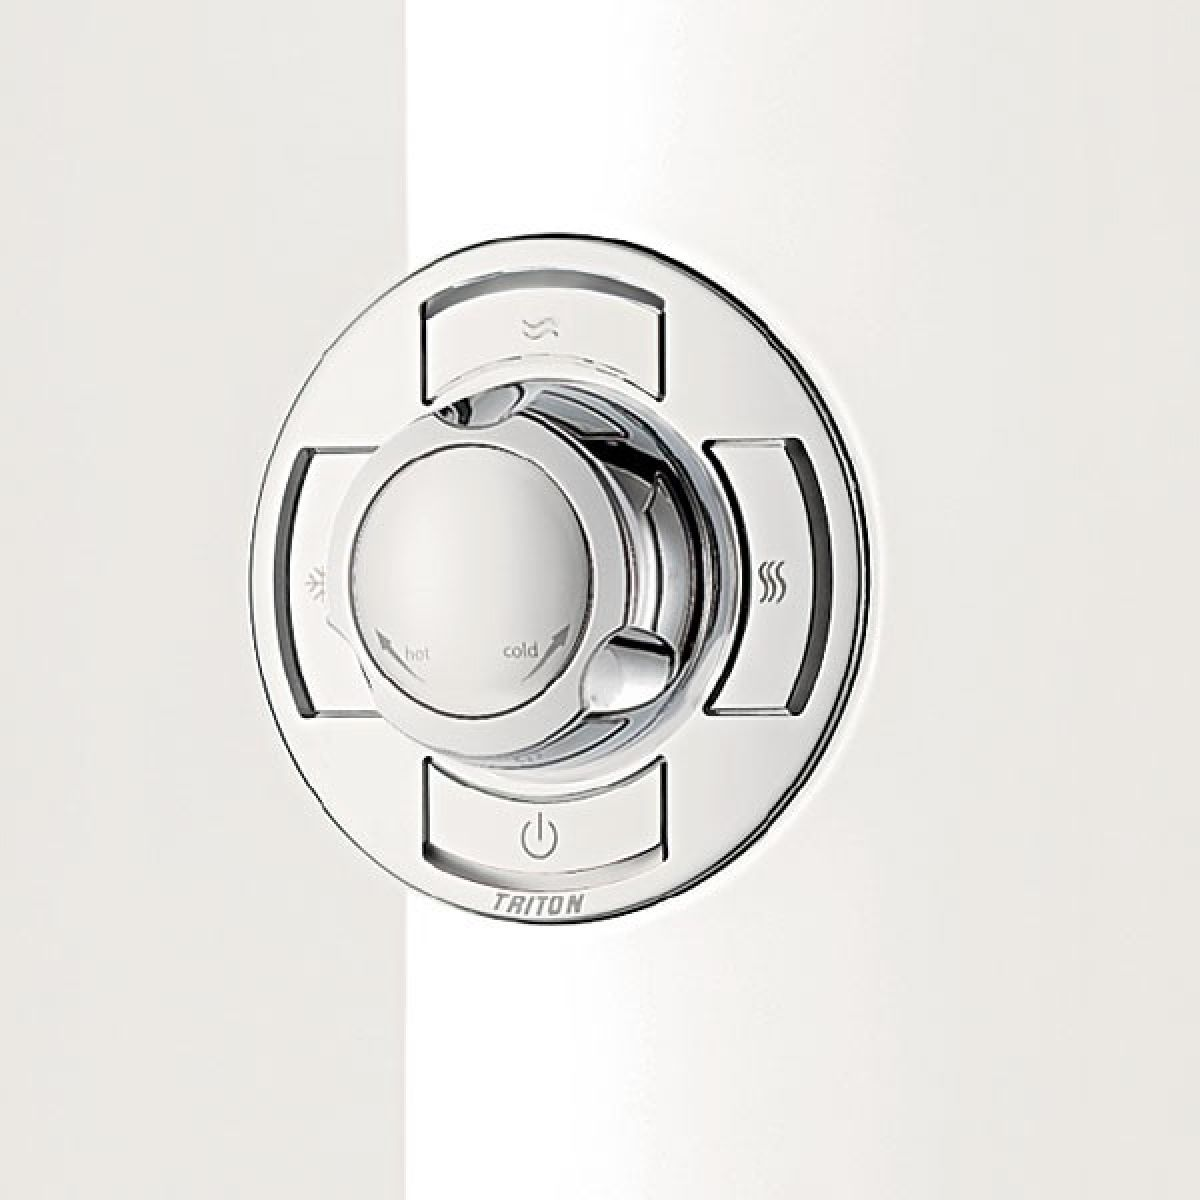 Triton Aspirante White Gloss Electric Shower Detail